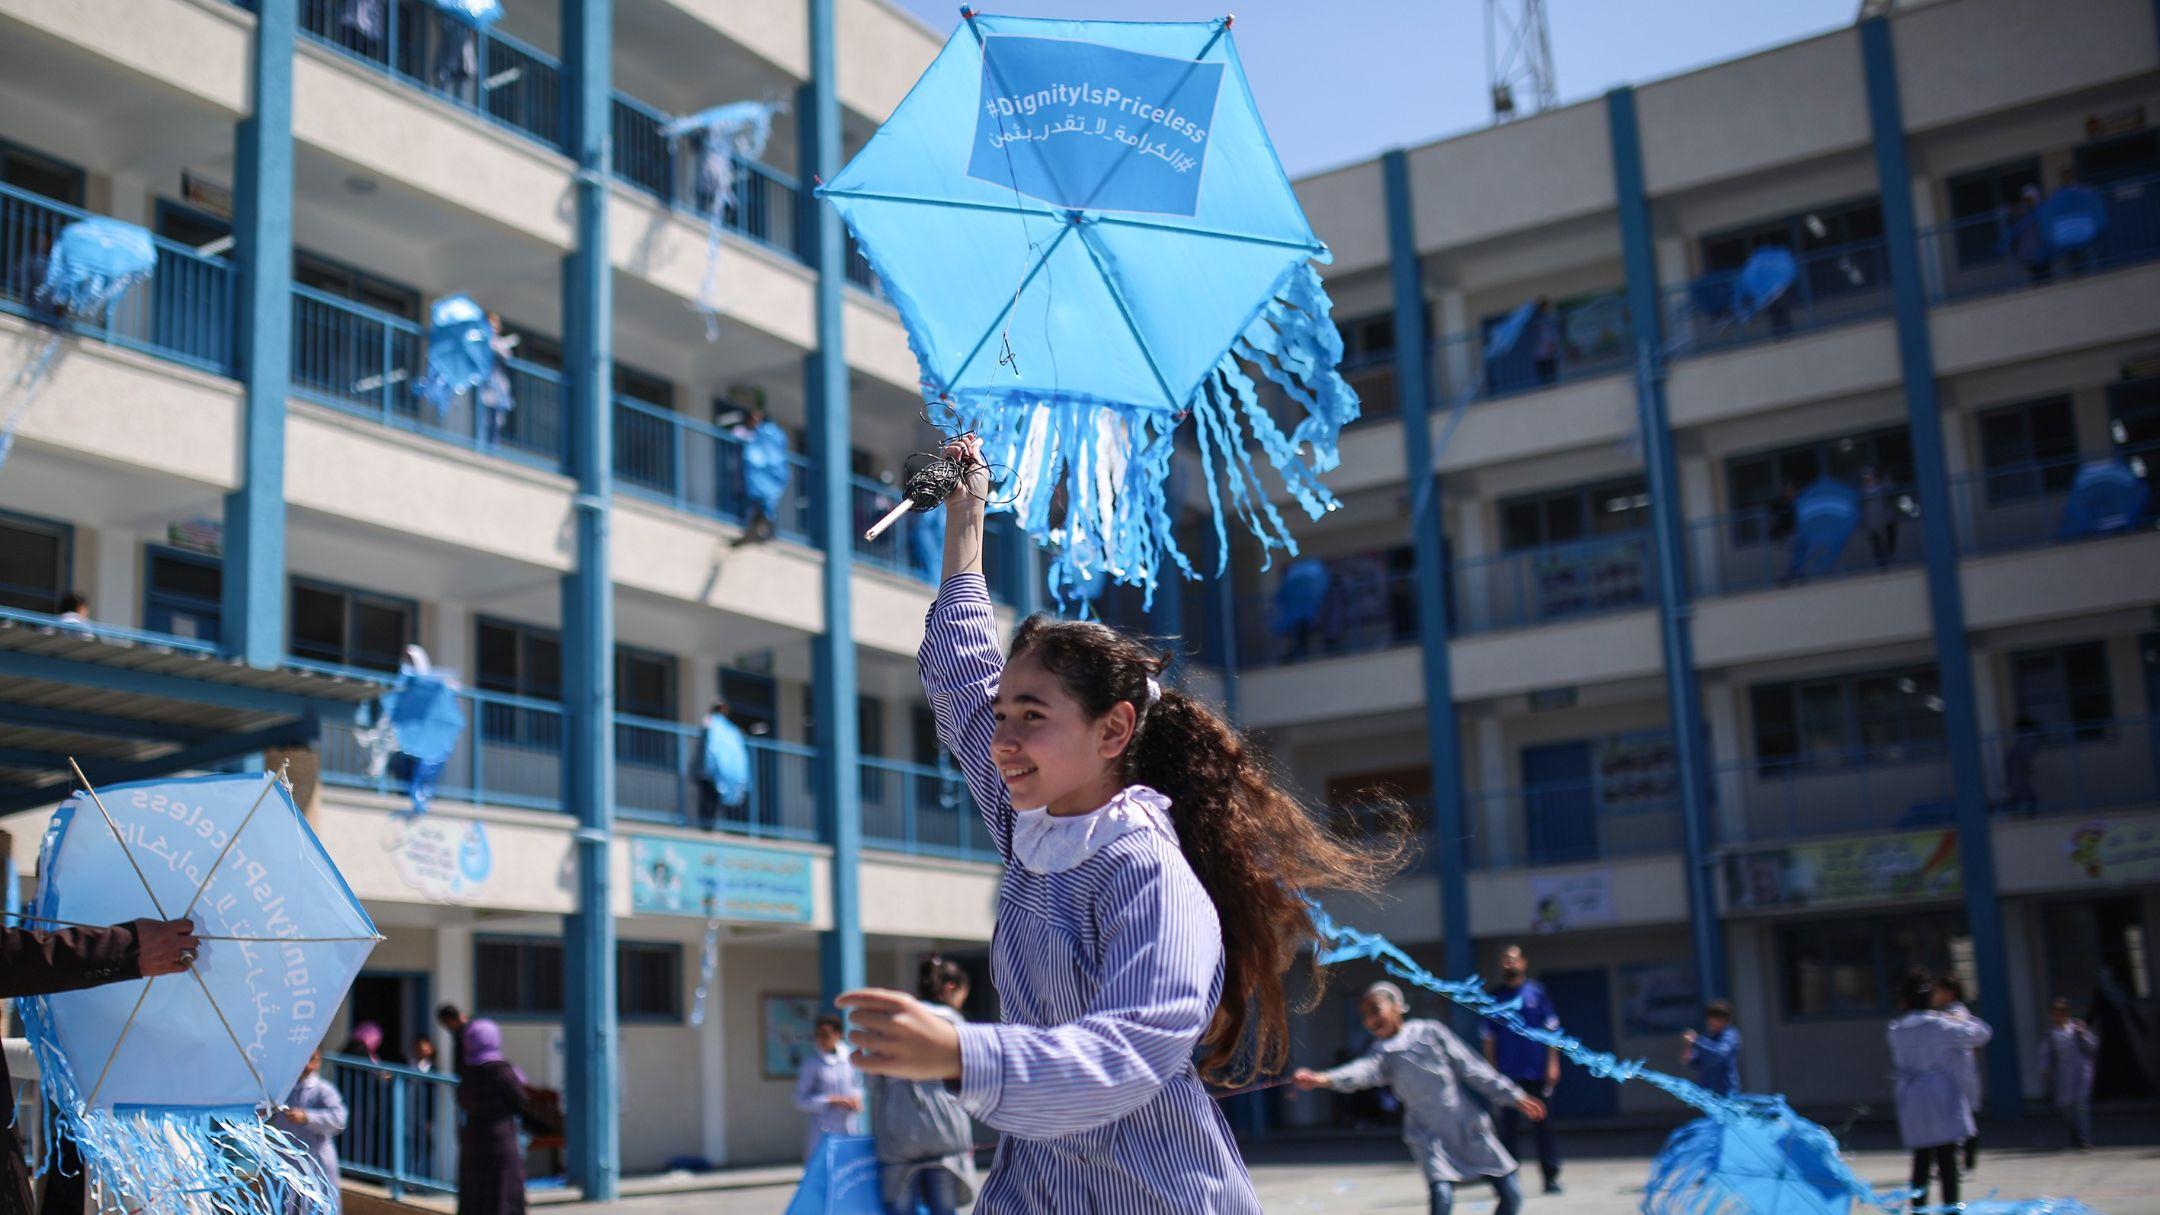 Biden administration says it has UNRWA's commitment to 'zero tolerance' for anti-Semitism